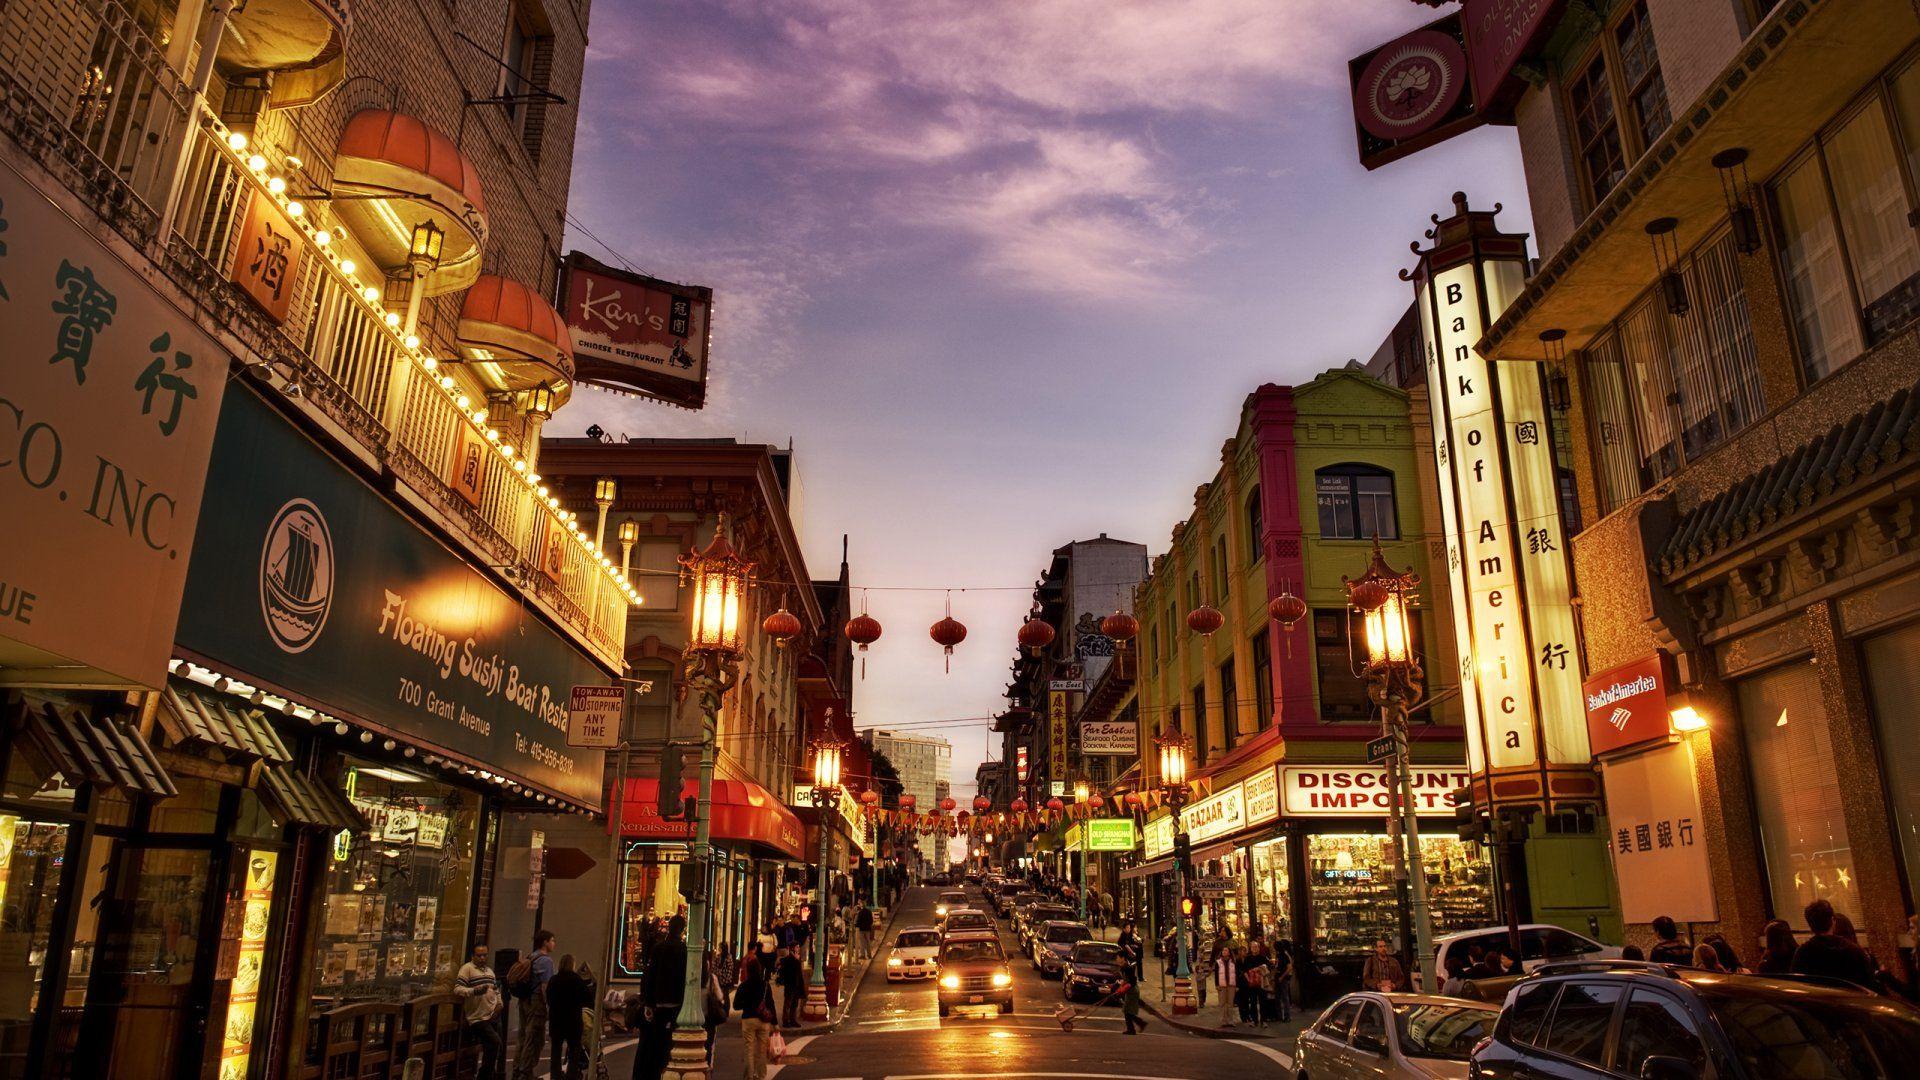 San Francisco Chinatown Dusk Stores Lights City